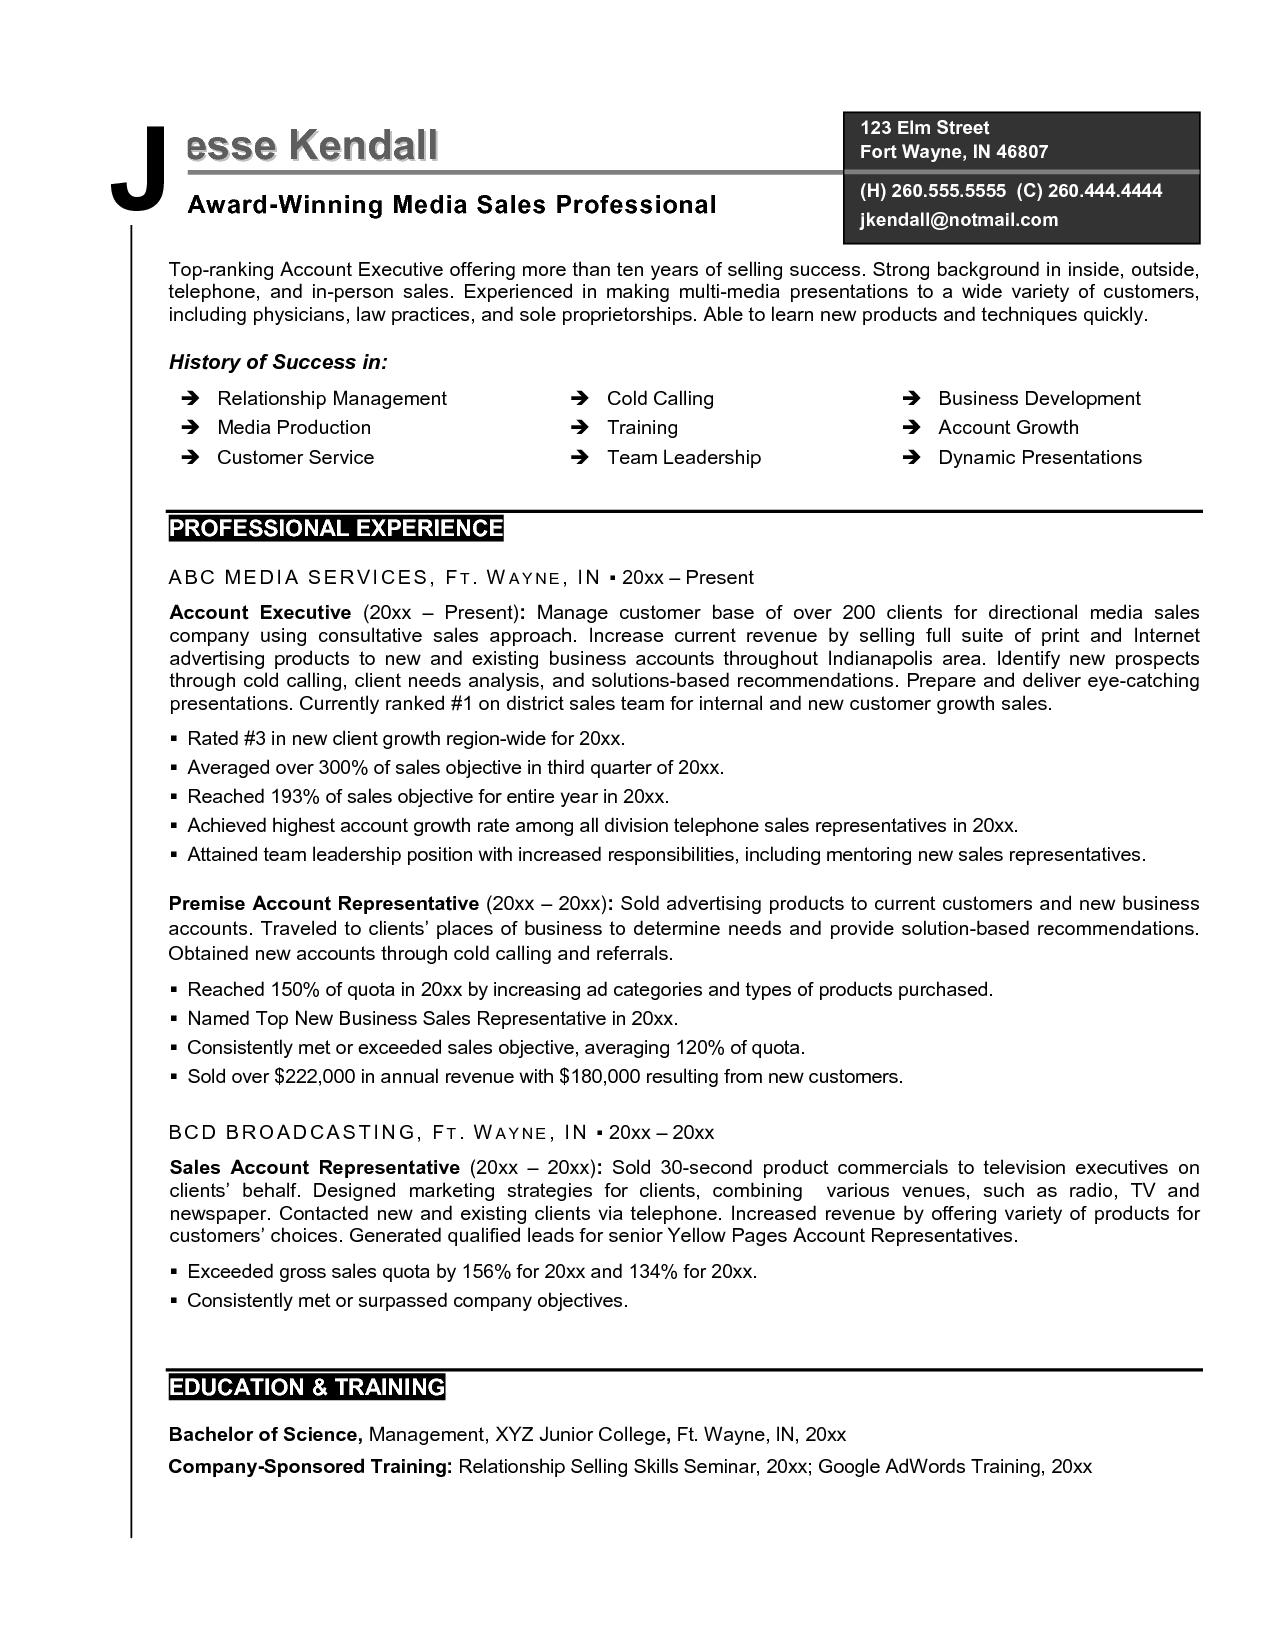 Real Estate Agent Resume Examples in 2020 Teacher resume